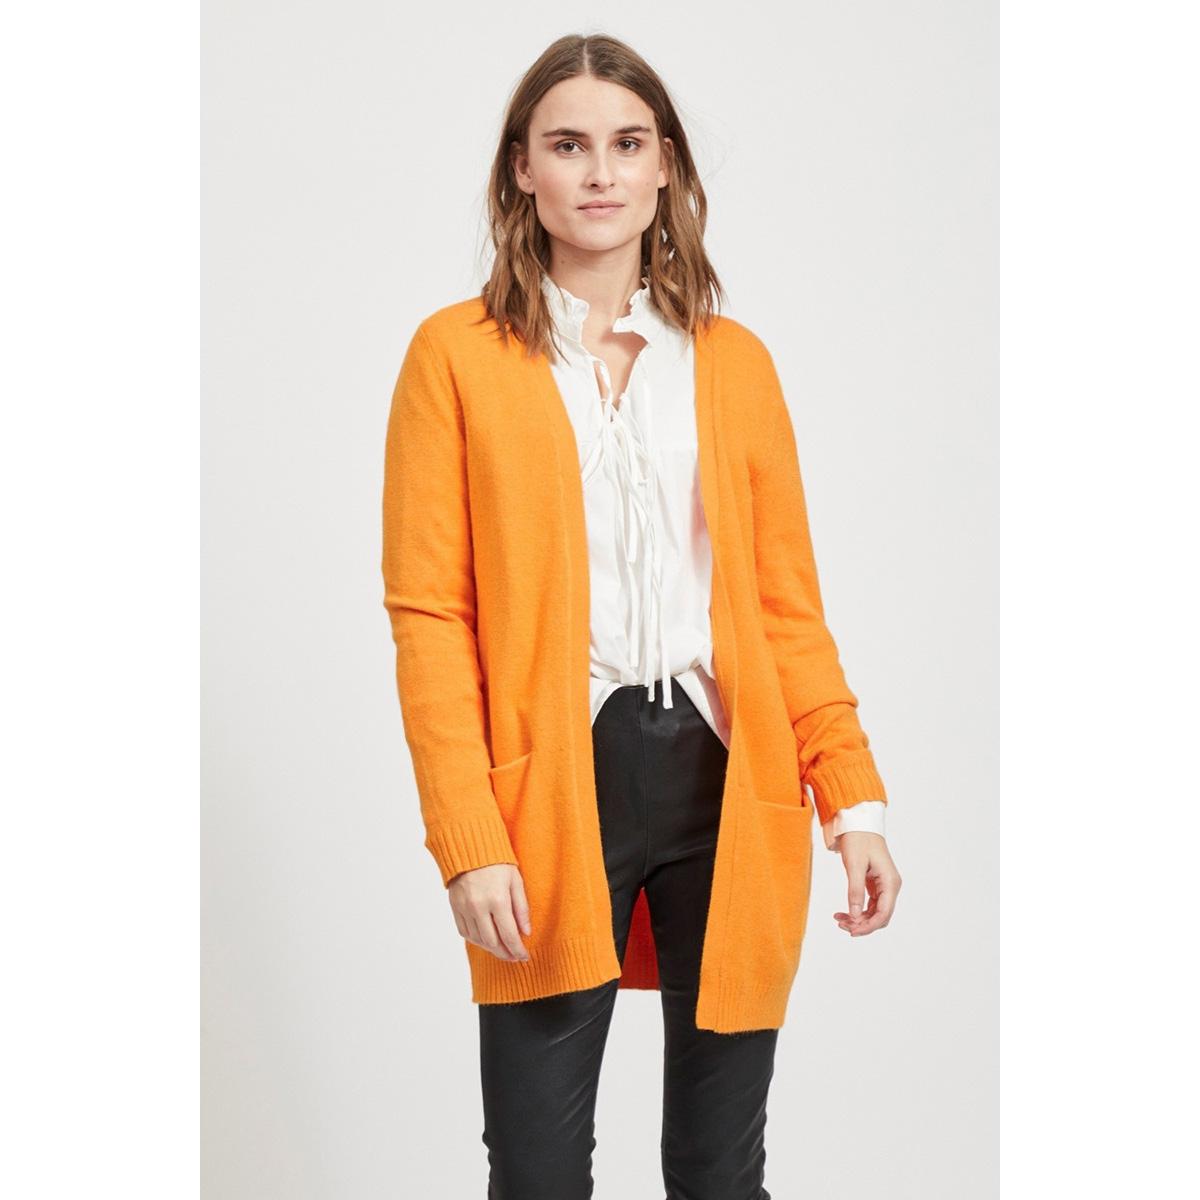 viril l/s open knit cardigan-fav 14044095 vila vest apricot/melange